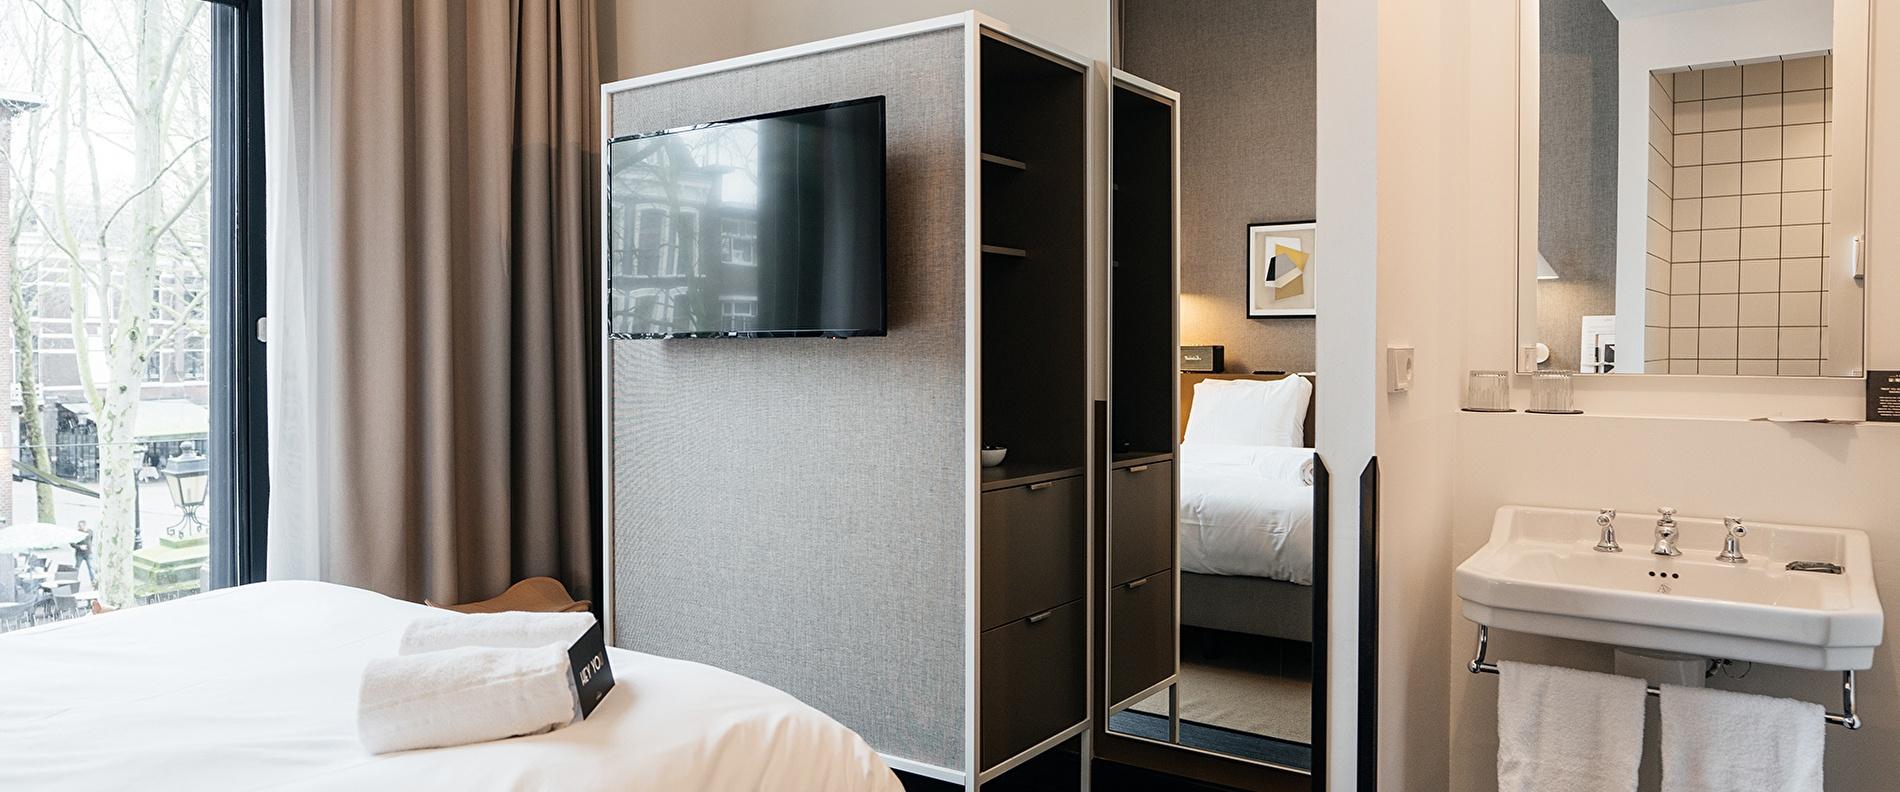 SMALL ROOM - THE HUNFELD